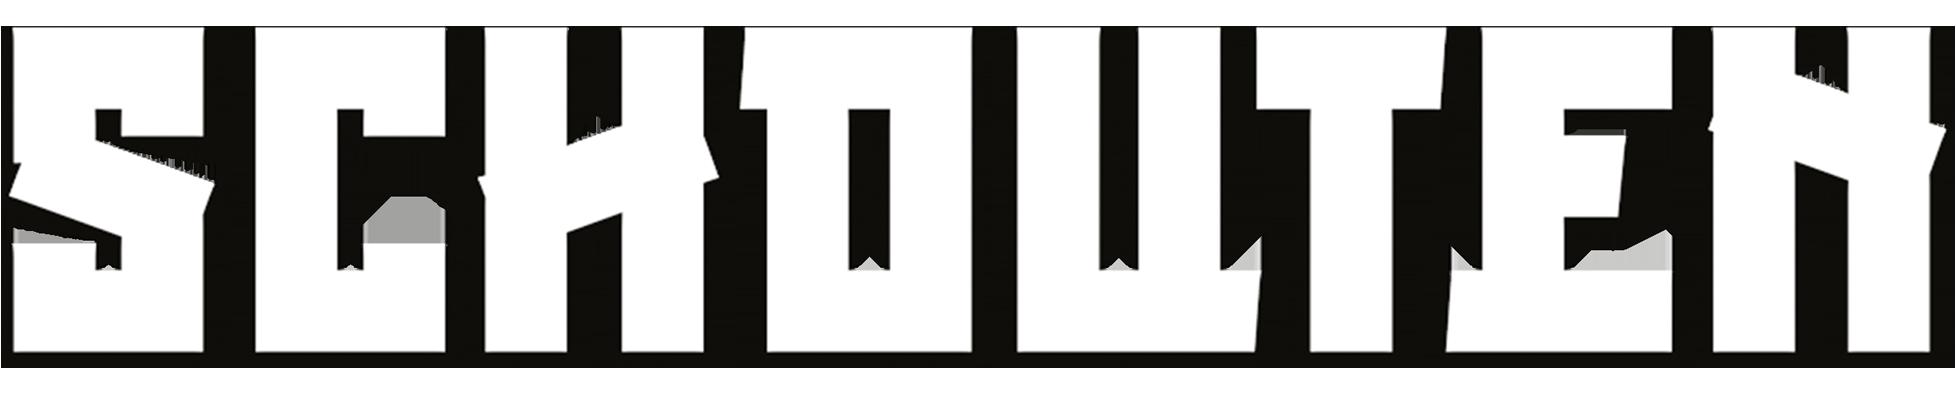 Schouten_Logo 2.png